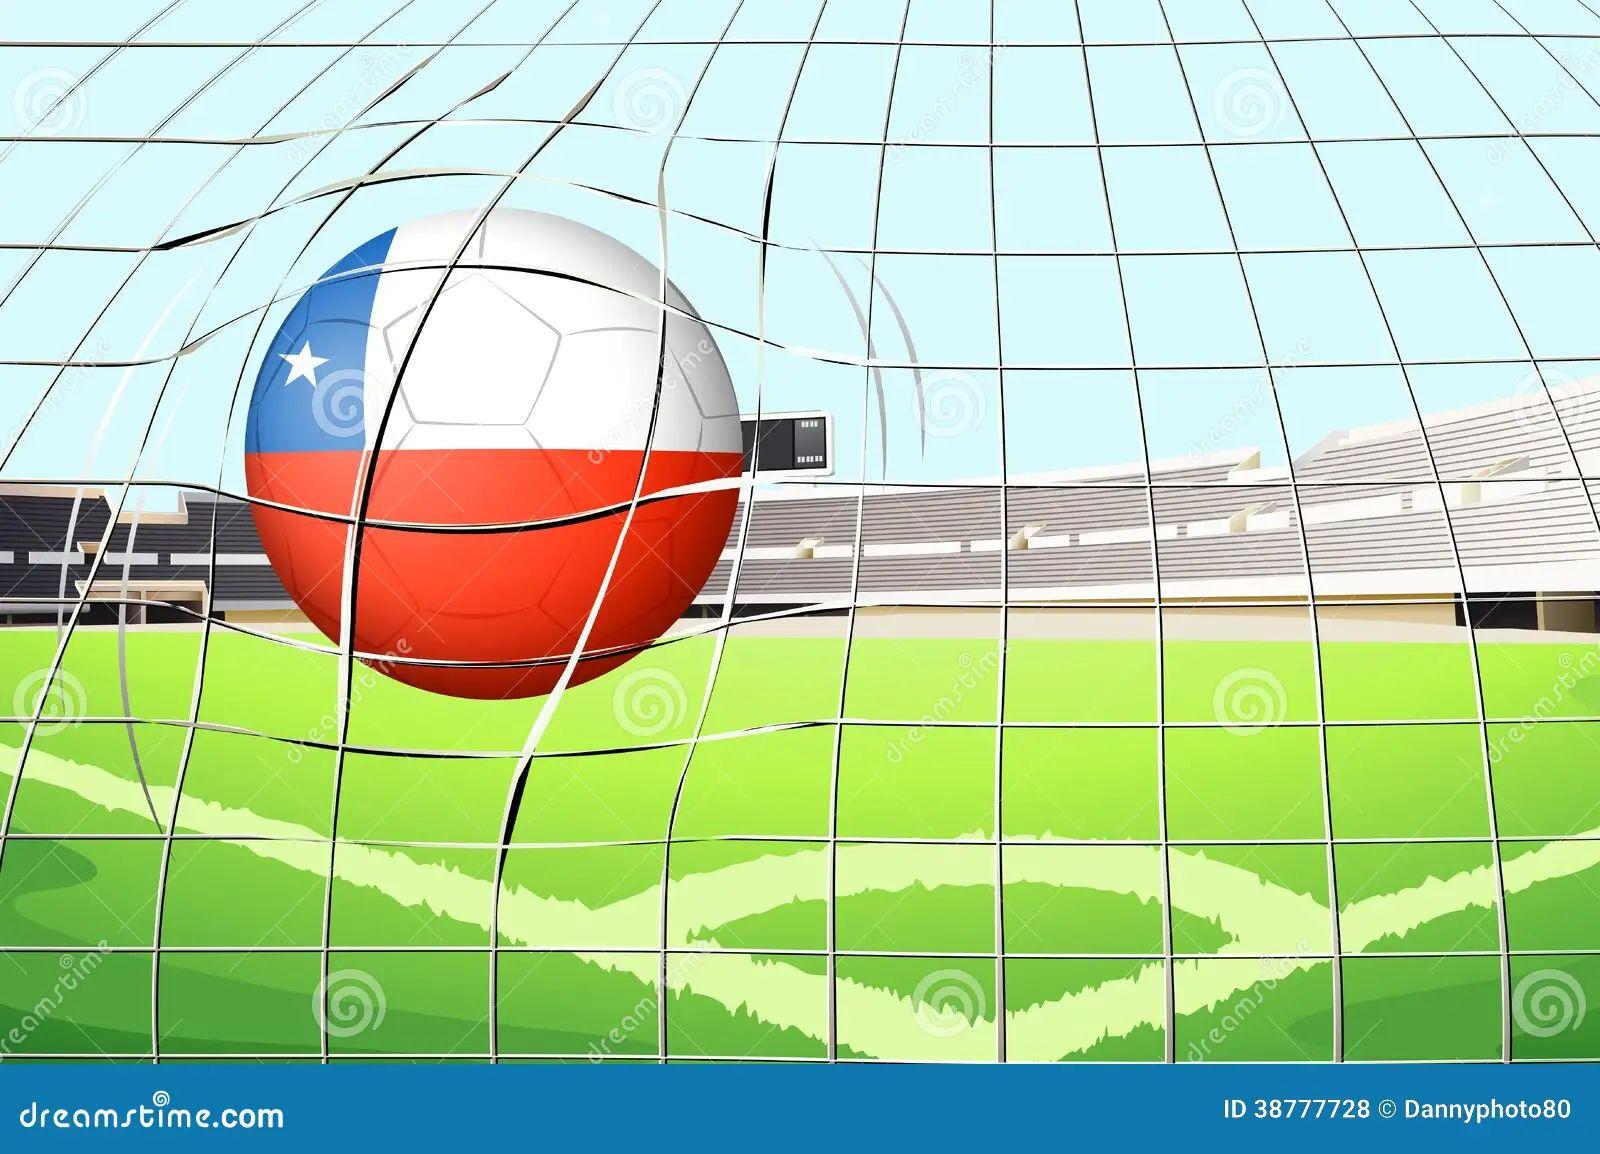 a ball hitting the soccer goal vector illustration